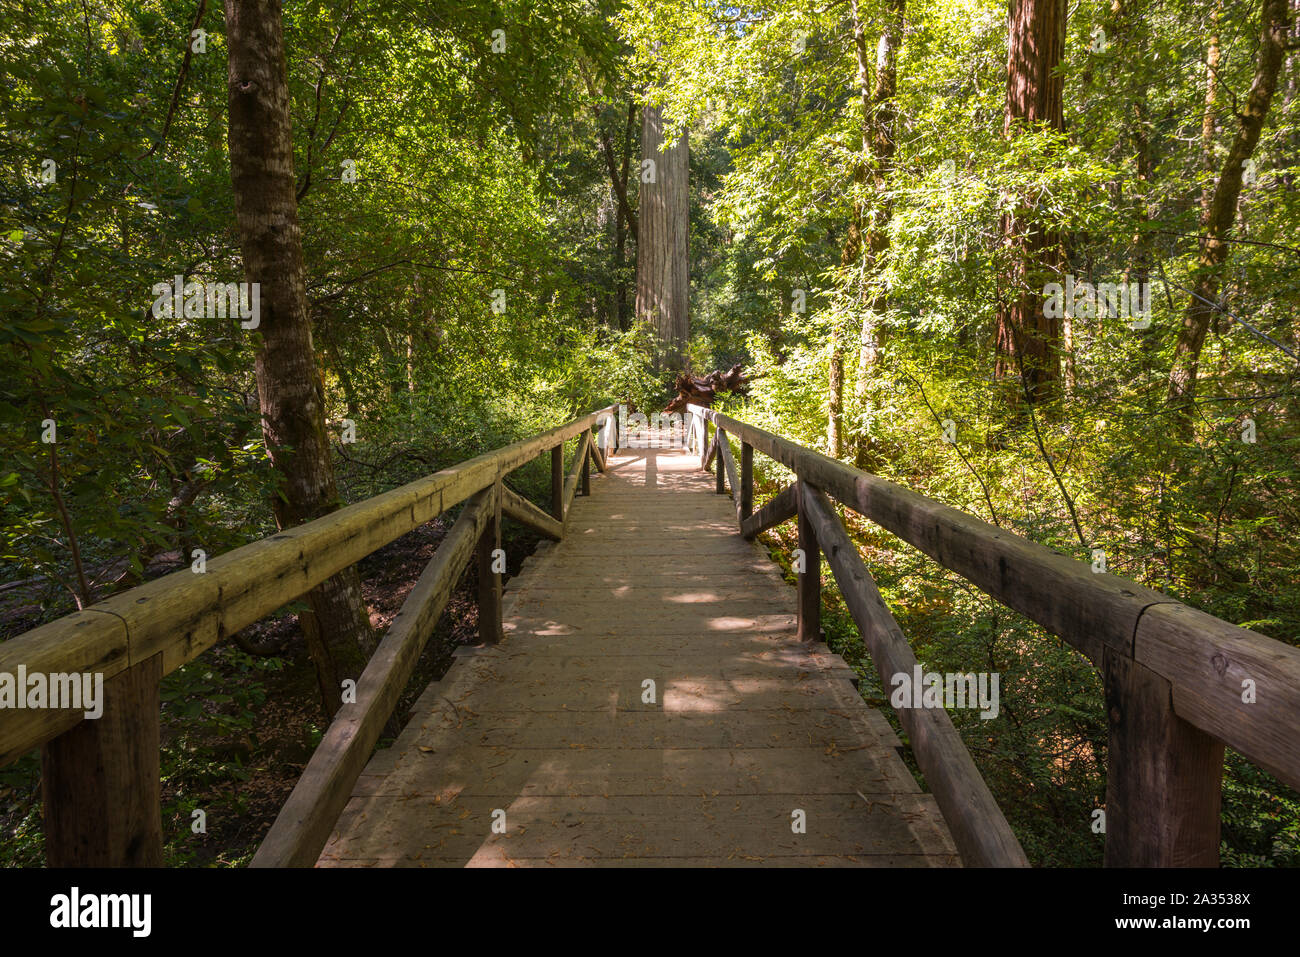 Big Basin Redwoods State Park.  Santa Cruz county, California, USA. Stock Photo